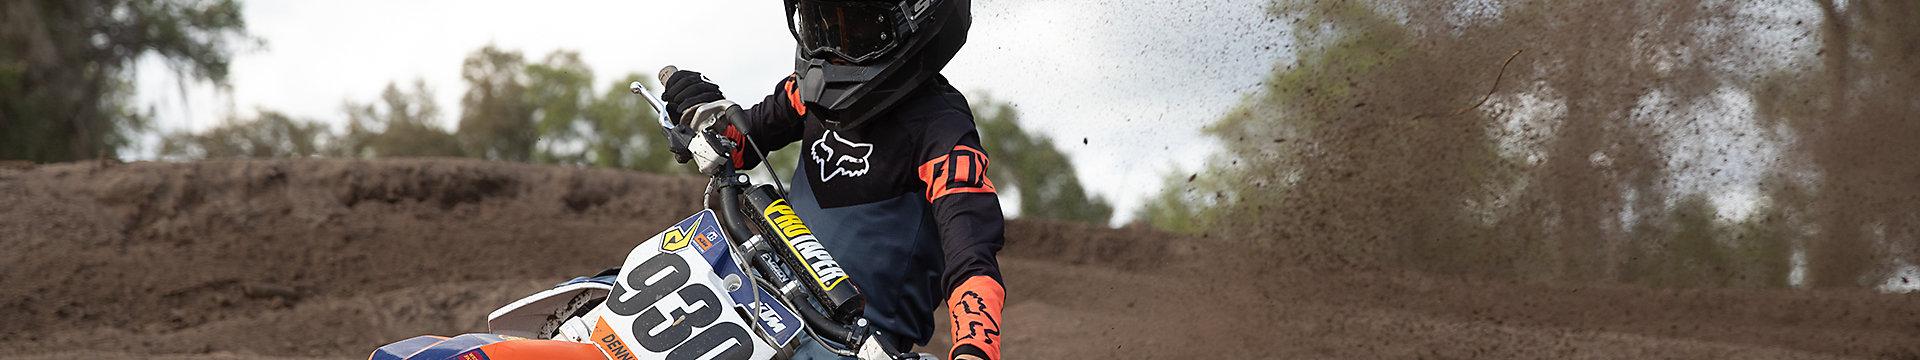 Fox Motocross Handsker